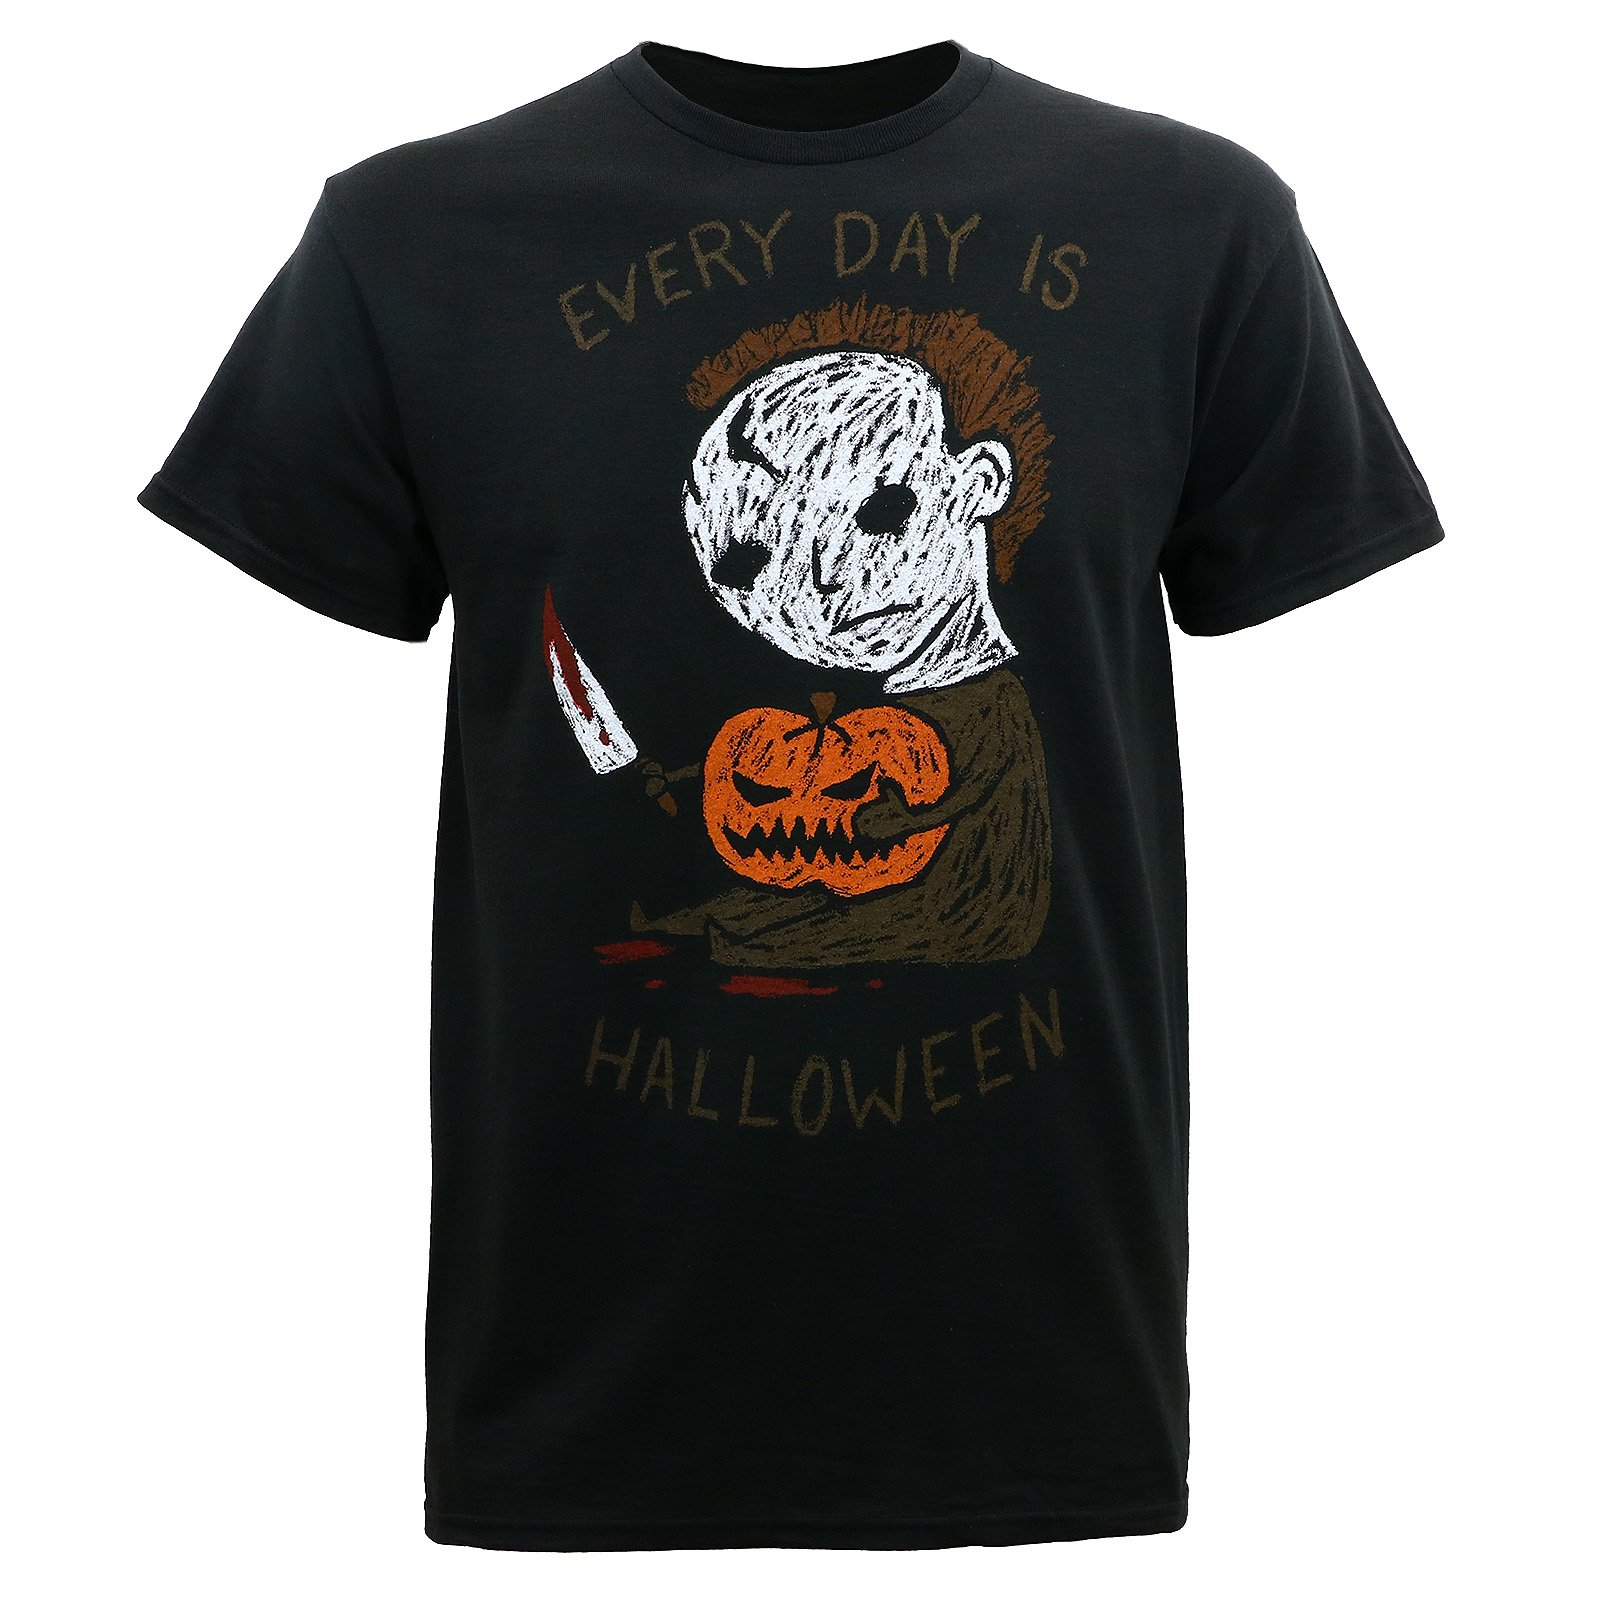 Changes Halloween S Everyday Is Halloween T Shirt